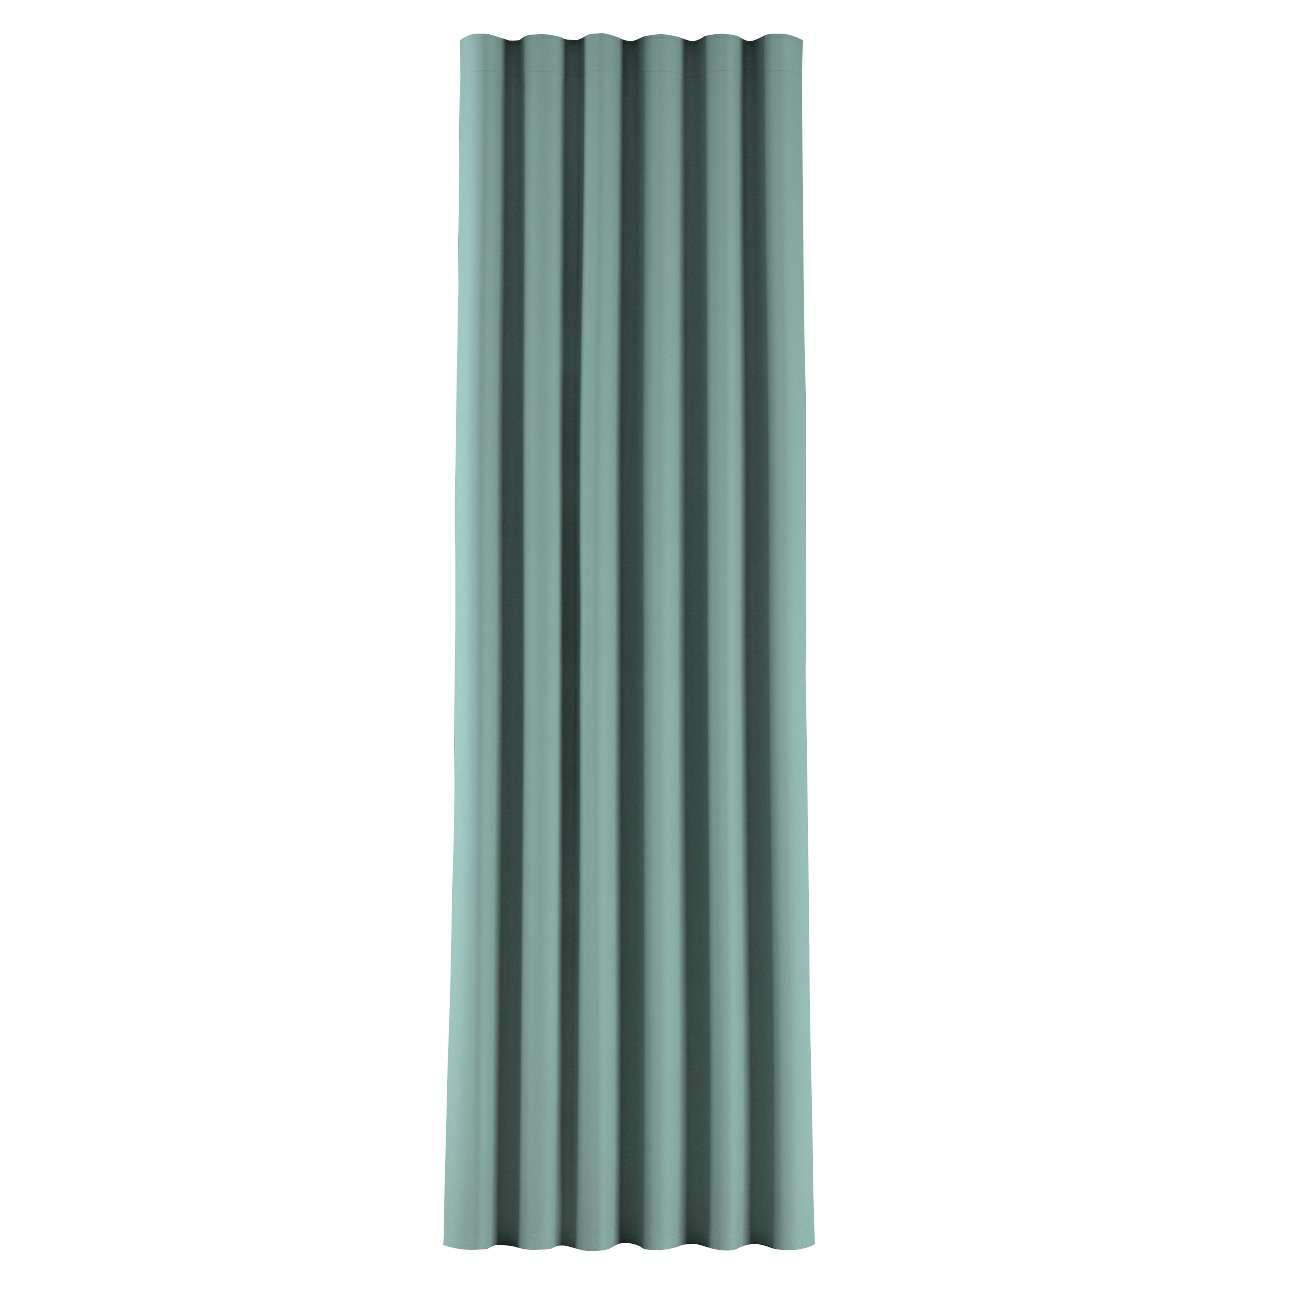 Zaves s riasením WAVE V kolekcii Blackout 280 cm, tkanina: 269-09